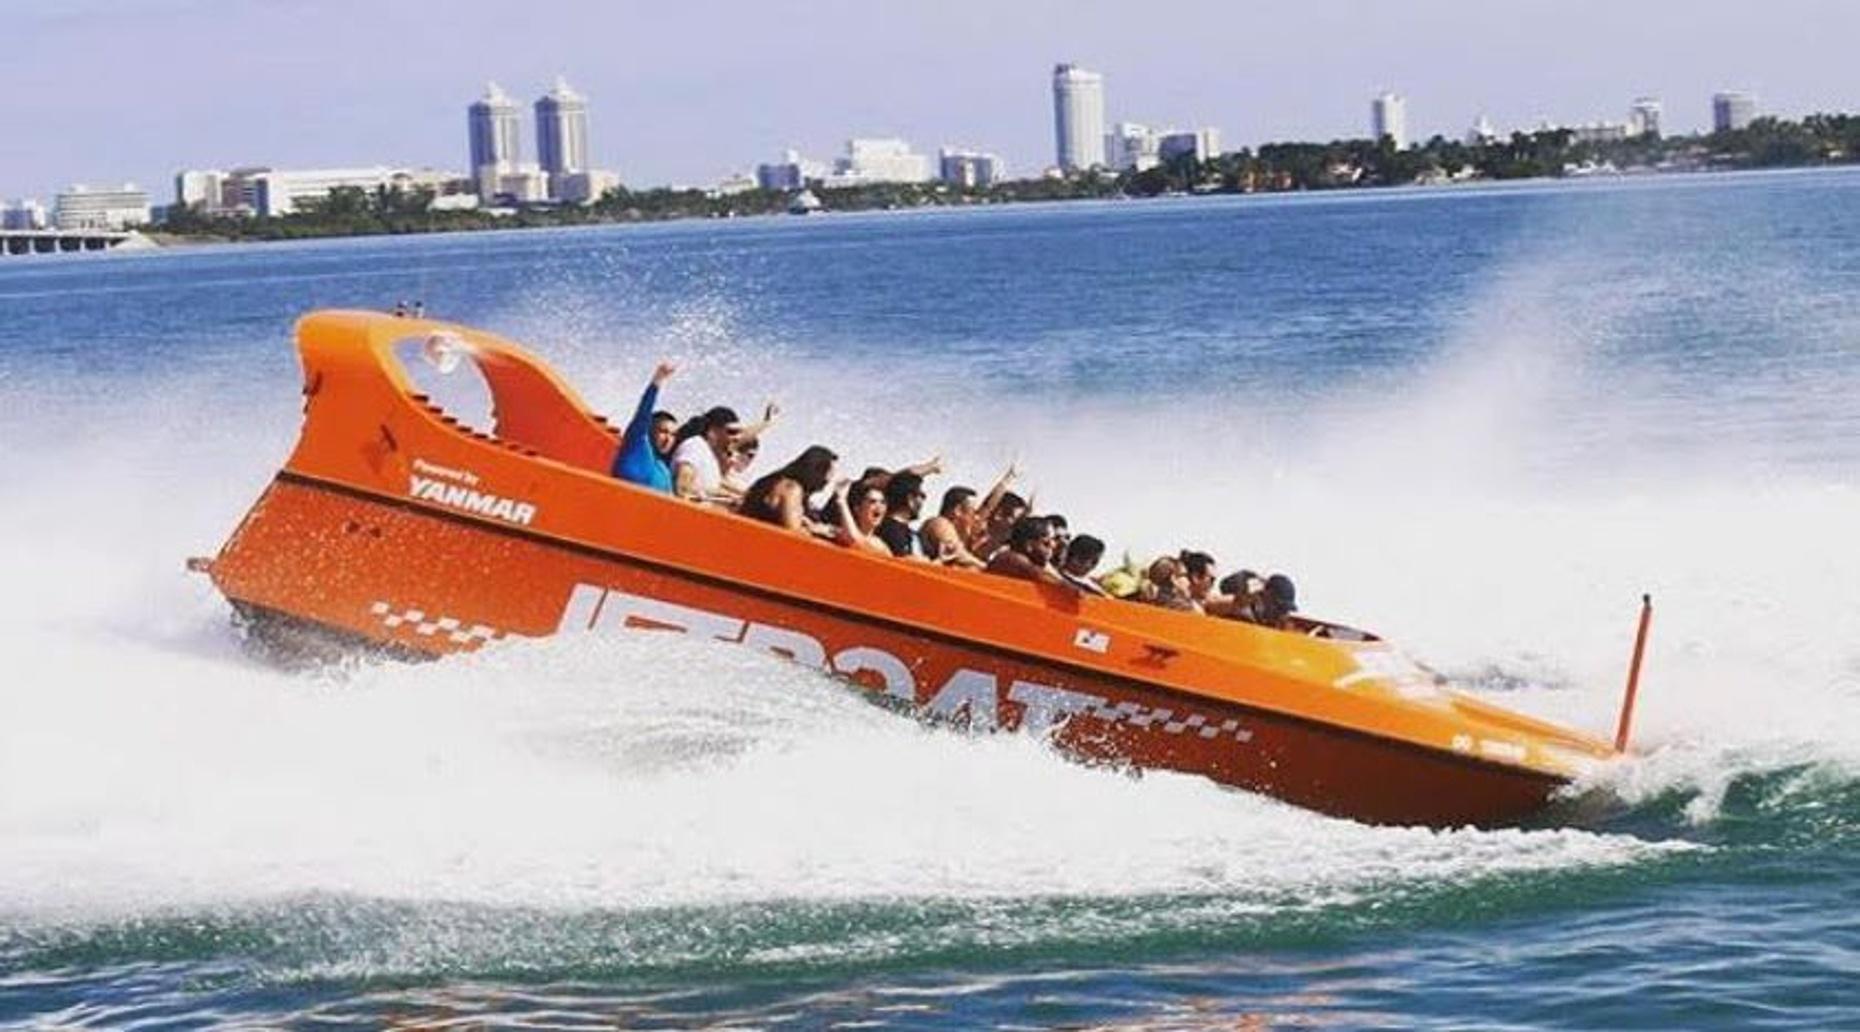 Adrenaline Junkie Jet Boat Ride